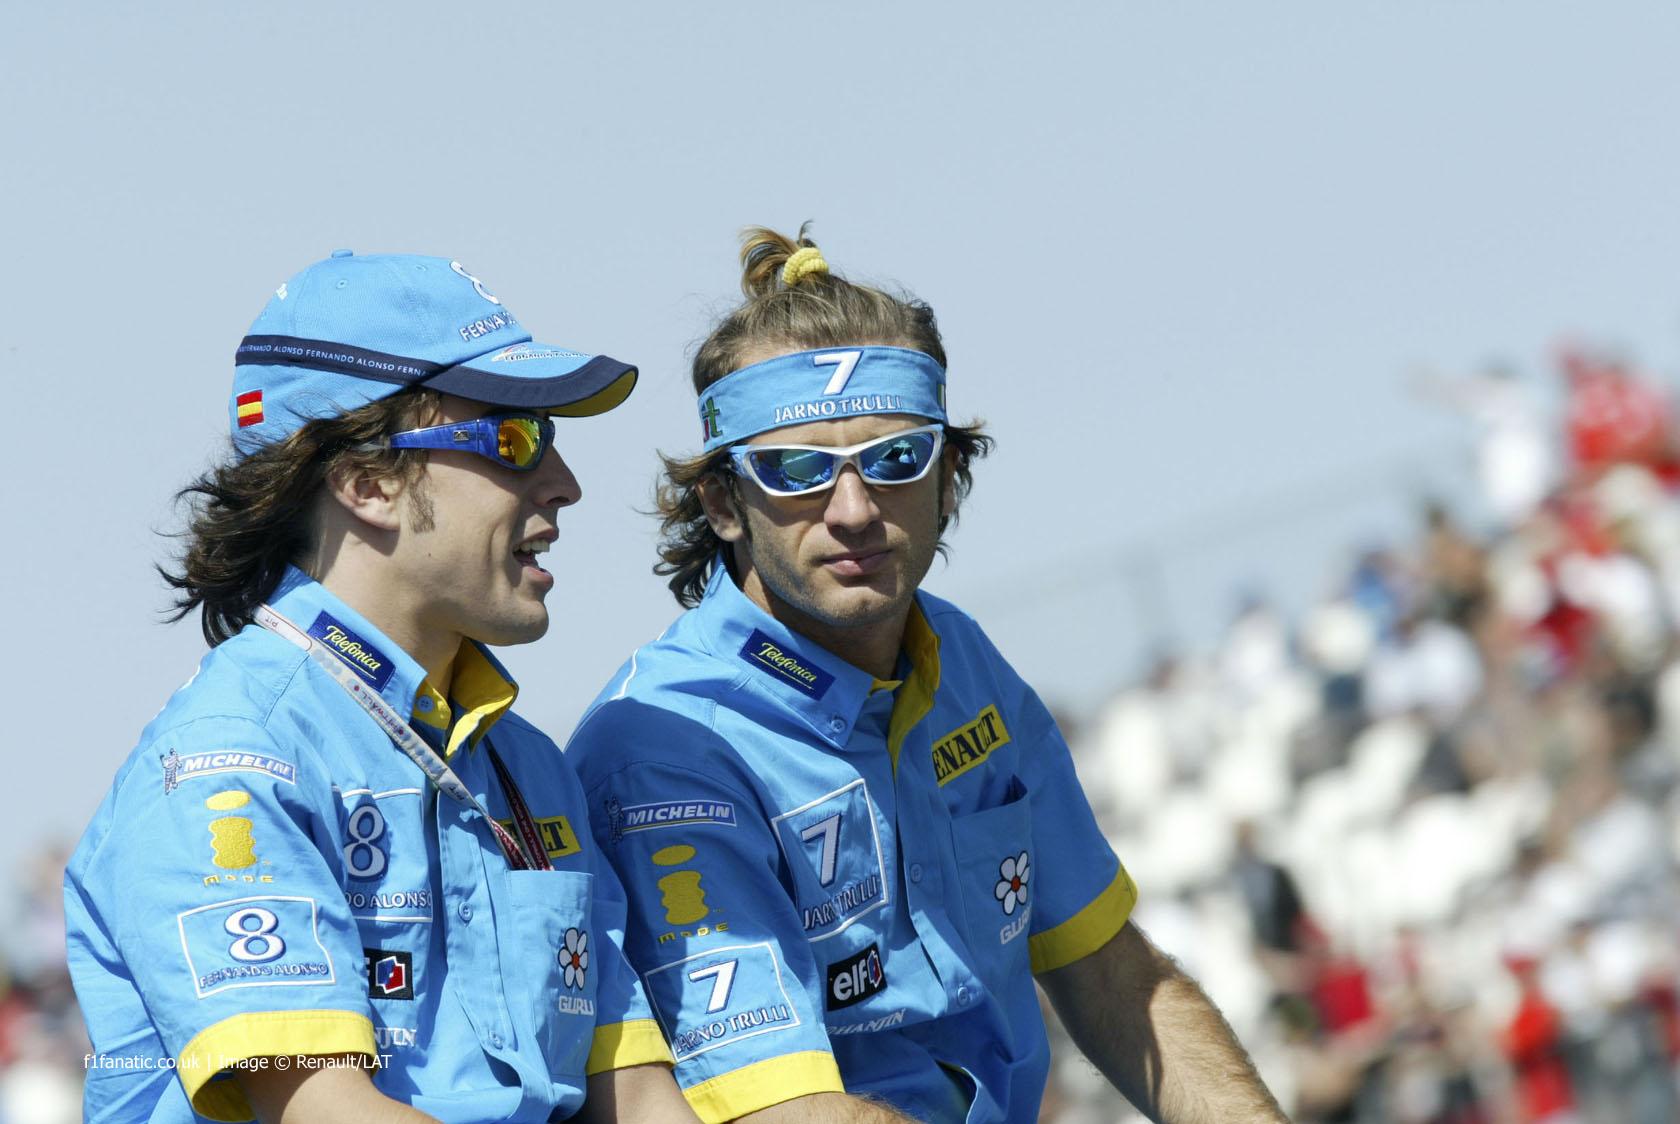 Fernando Alonso, Jarno Trulli, Renault, 2004